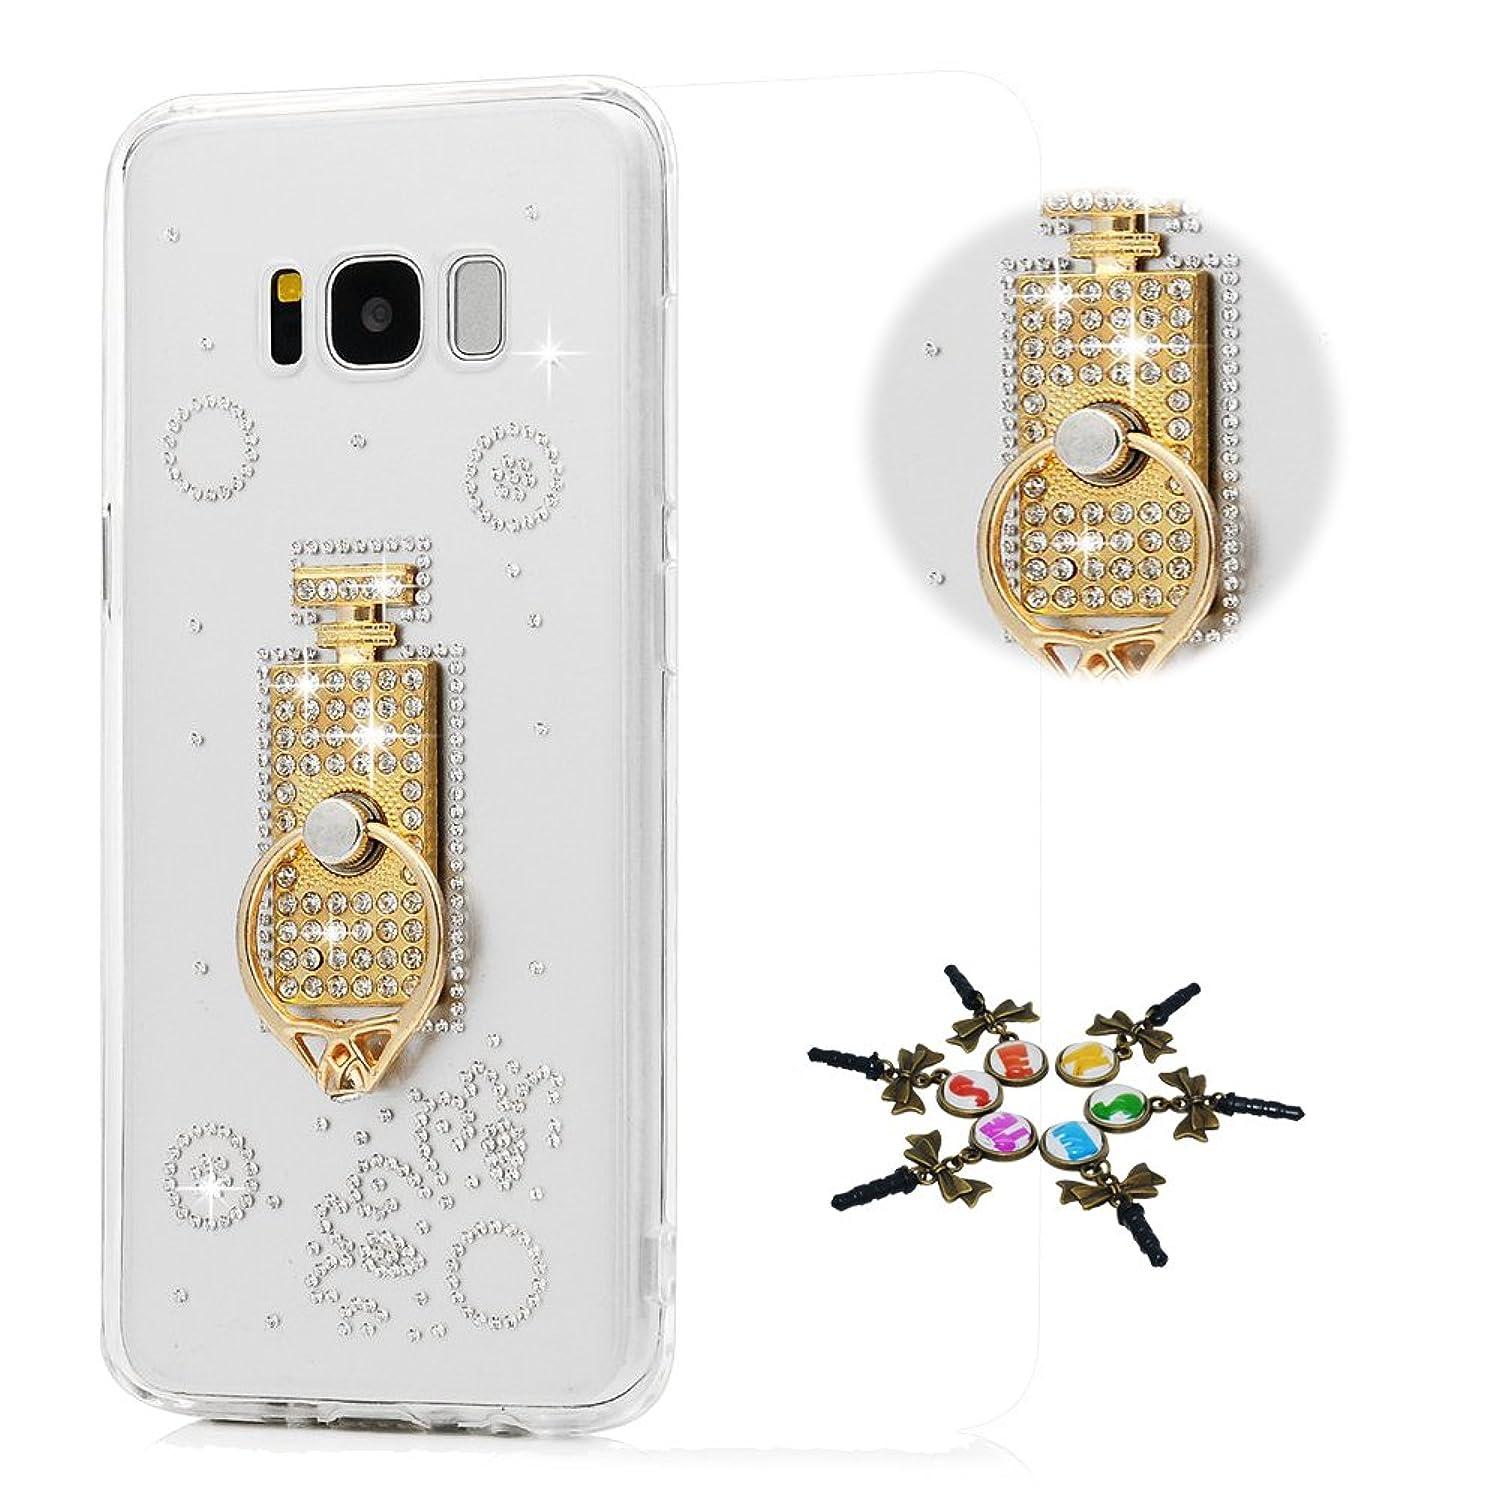 STENES Galaxy J7 Case - Stylish - 100+ Bling Crystal - 3D Handmade Perfume Bottle Ring Stand Design Cover Case for Samsung Galaxy J7 2017/J7 Sky Pro/J7 Perx/J7V 2017/J7 Prime/Halo - Gold